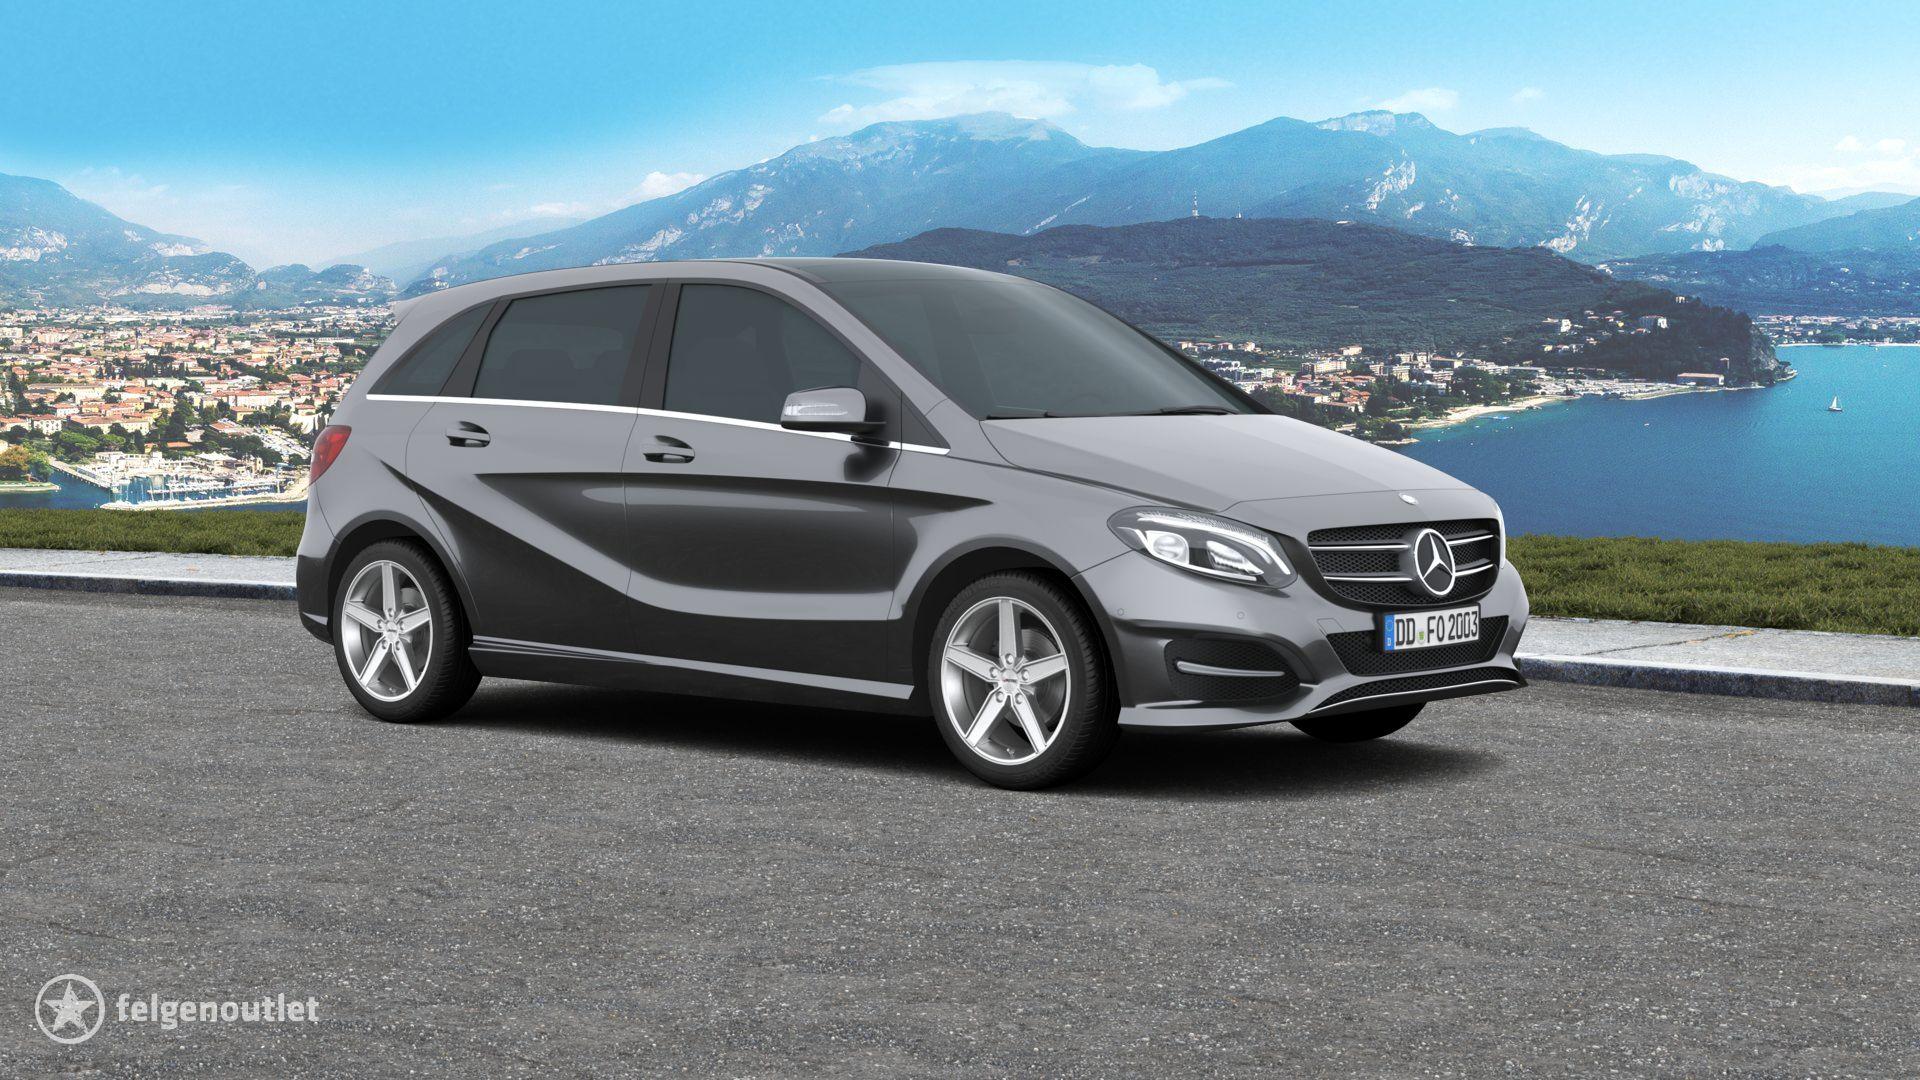 Autec Delano hyper silber Mercedes-Benz B-Klasse Kompaktvan